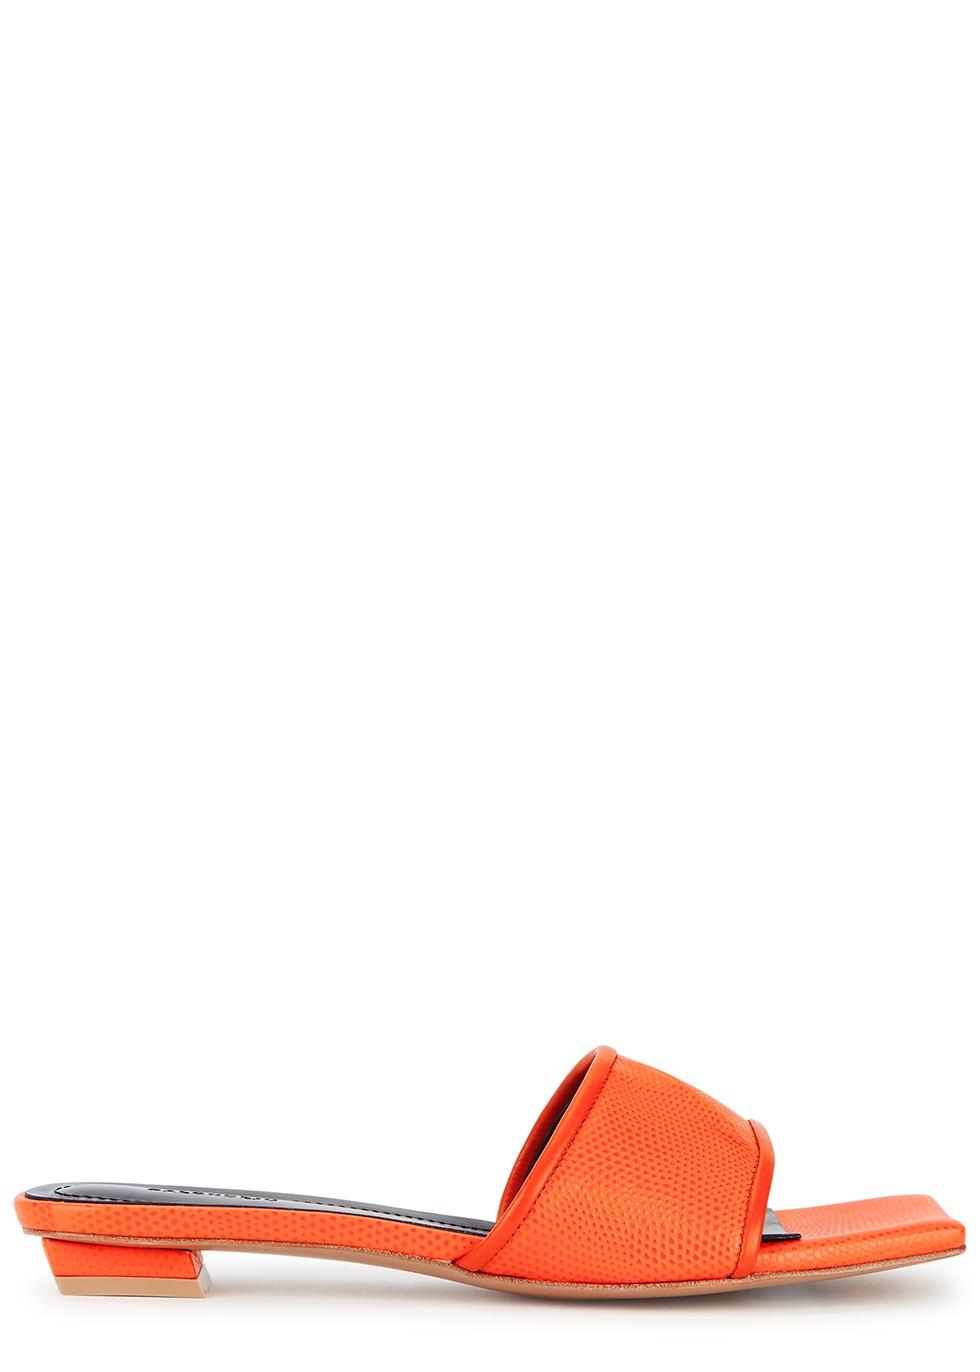 Volure orange lizard-effect mules